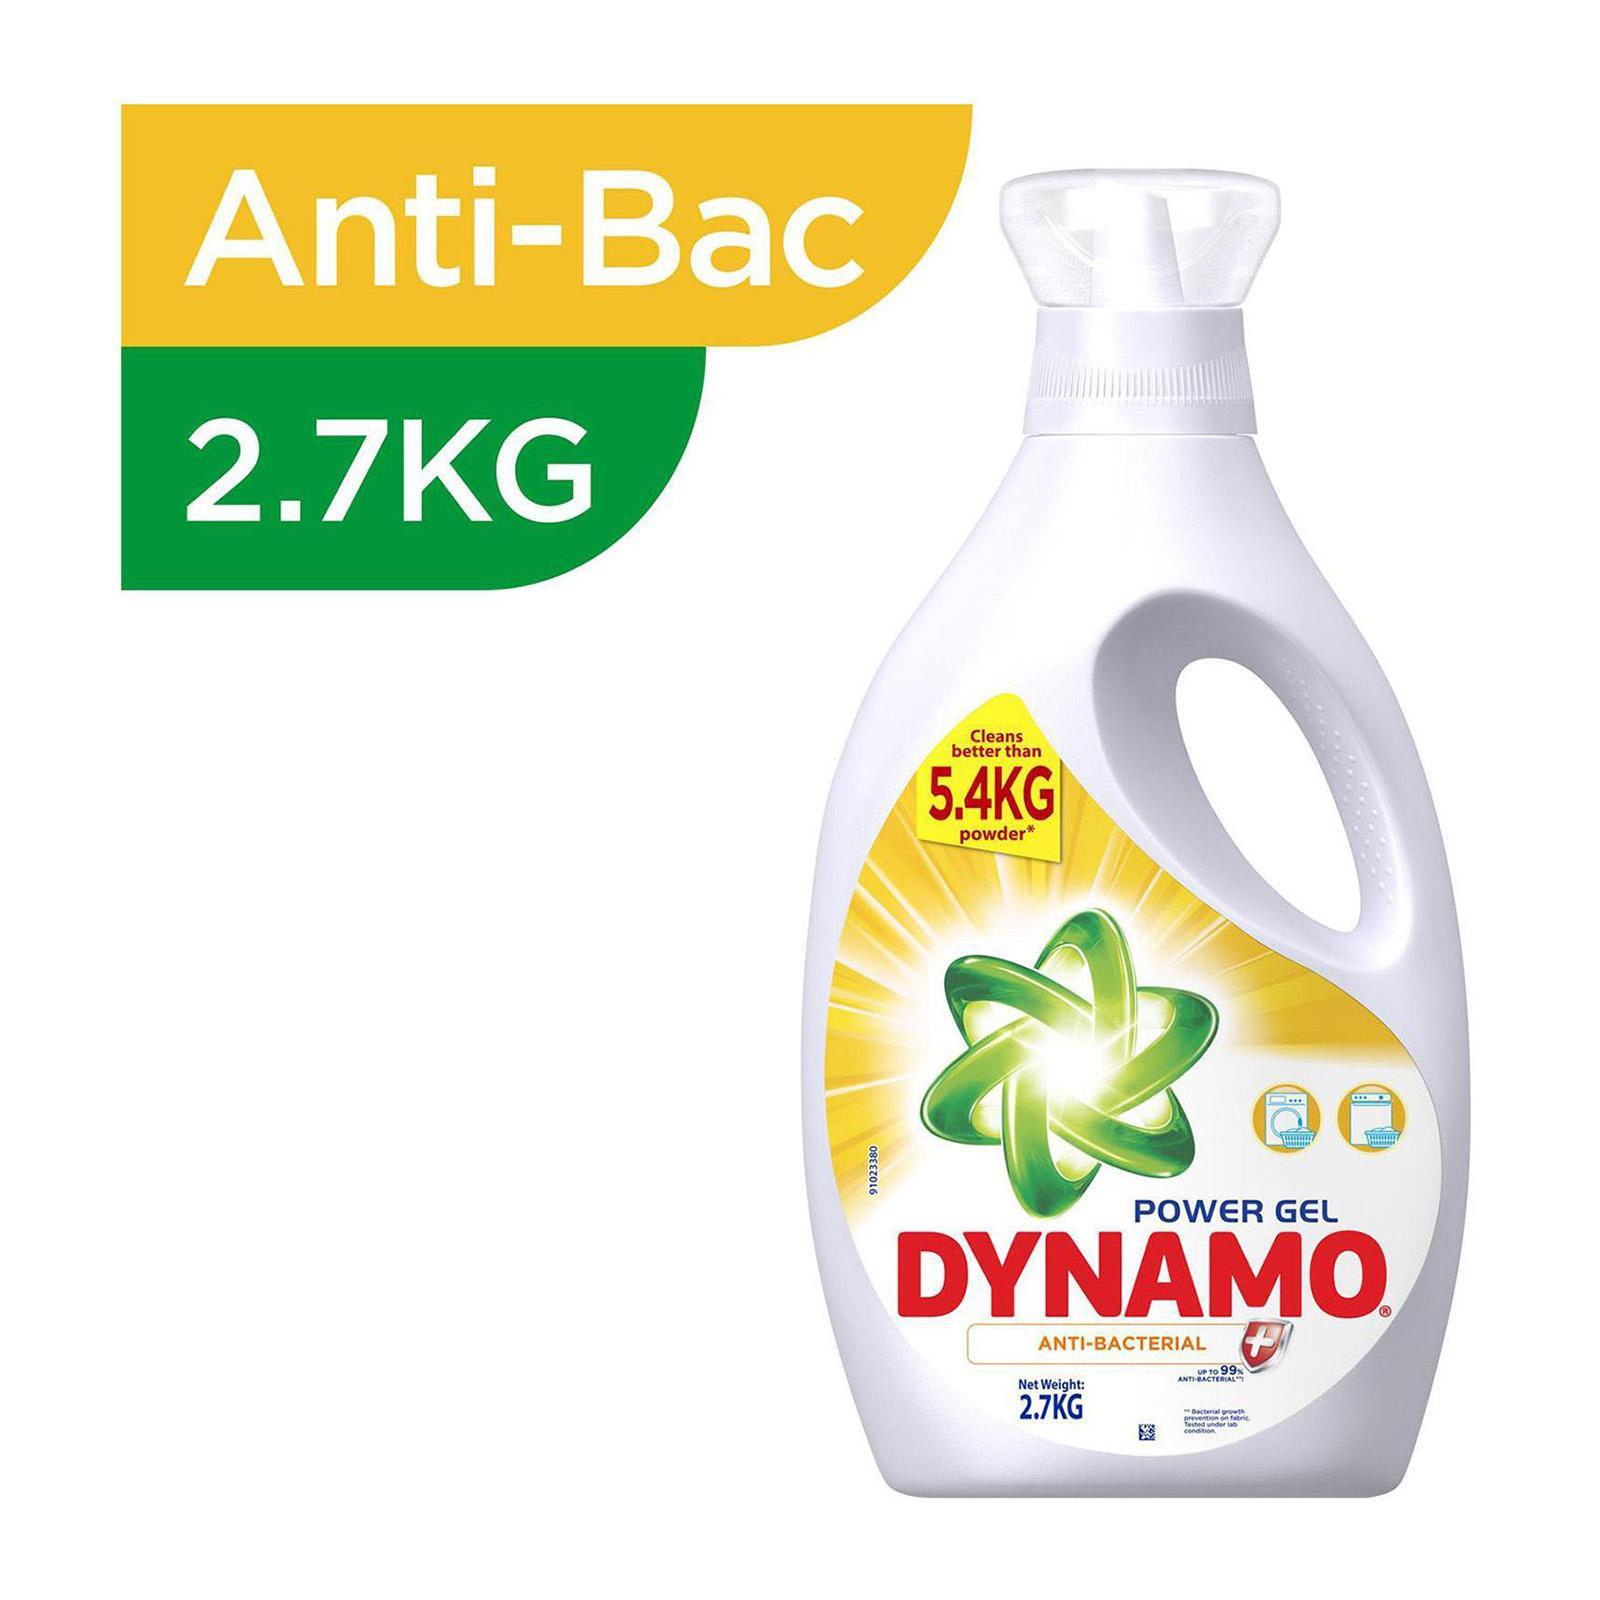 Dynamo Power Gel Anti-Bacterial Laundry Detergent Refill 1.44KG